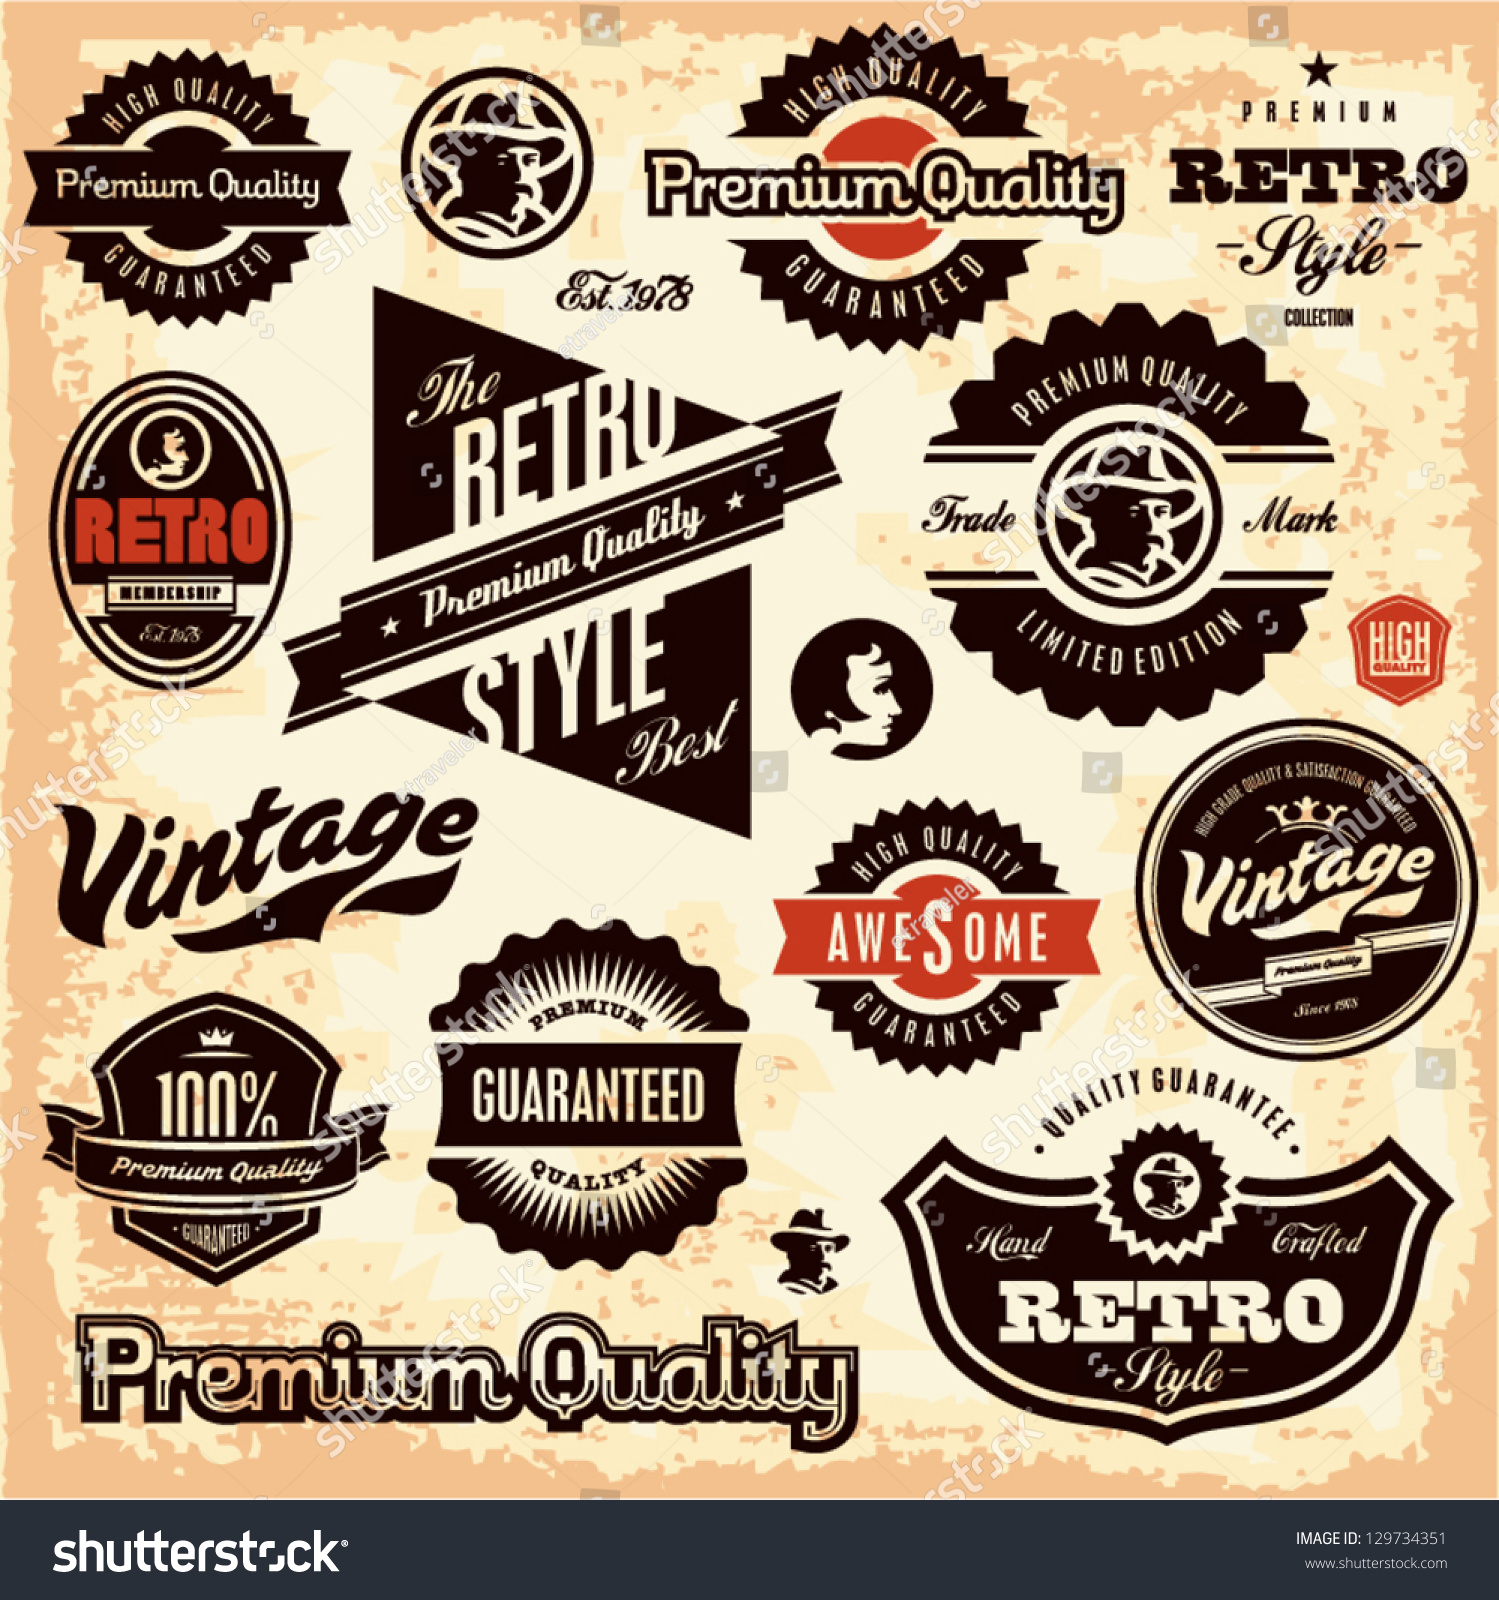 Premium Quality Badge And Banner Collection Vectors: Retro Labels Vintage Labels Collection Premium Stock